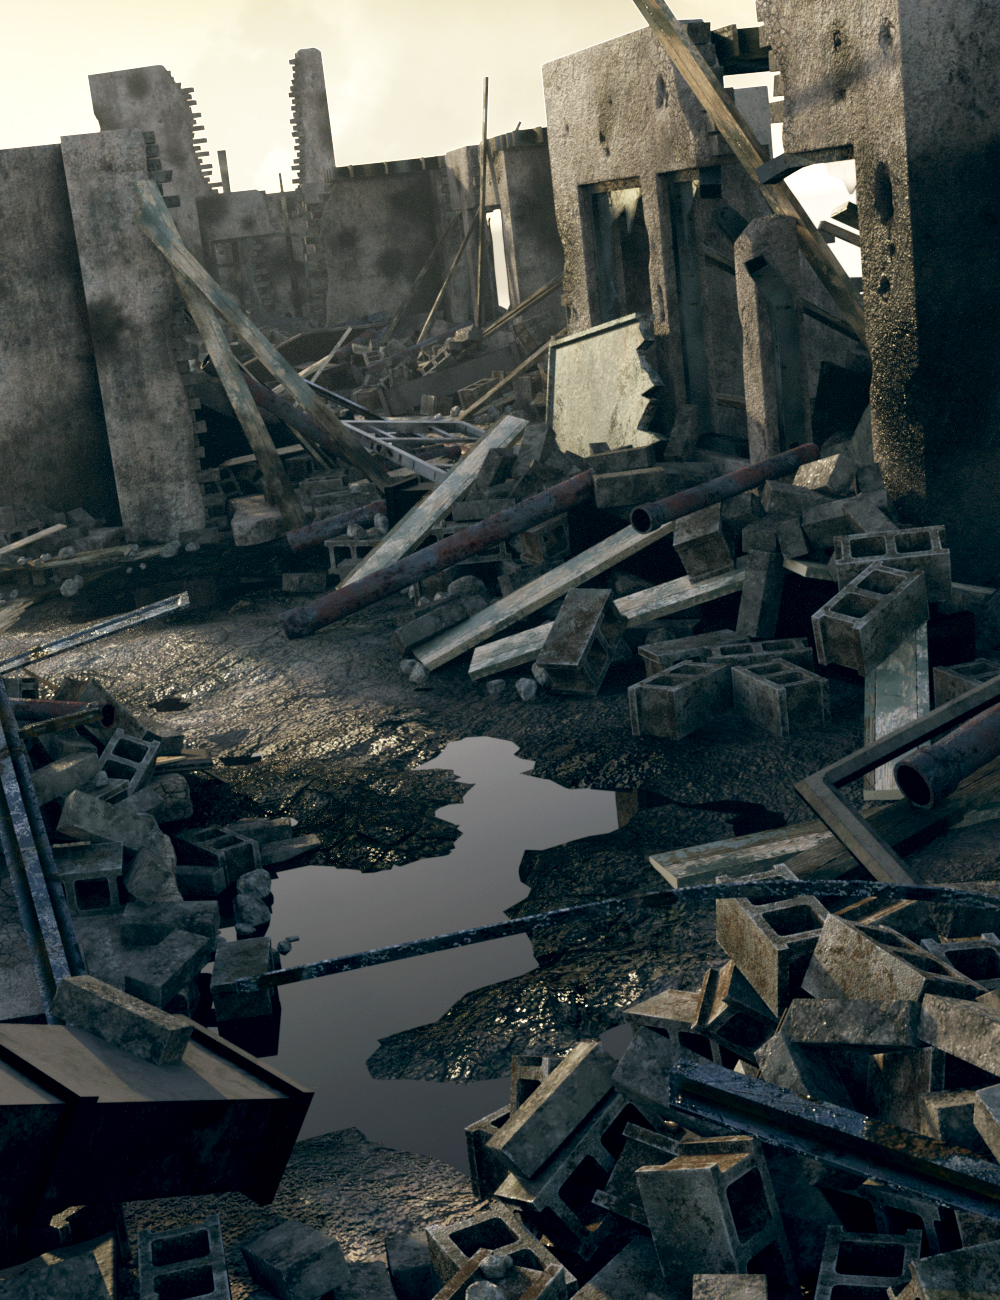 Modular Destruction by: The DigiVault, 3D Models by Daz 3D